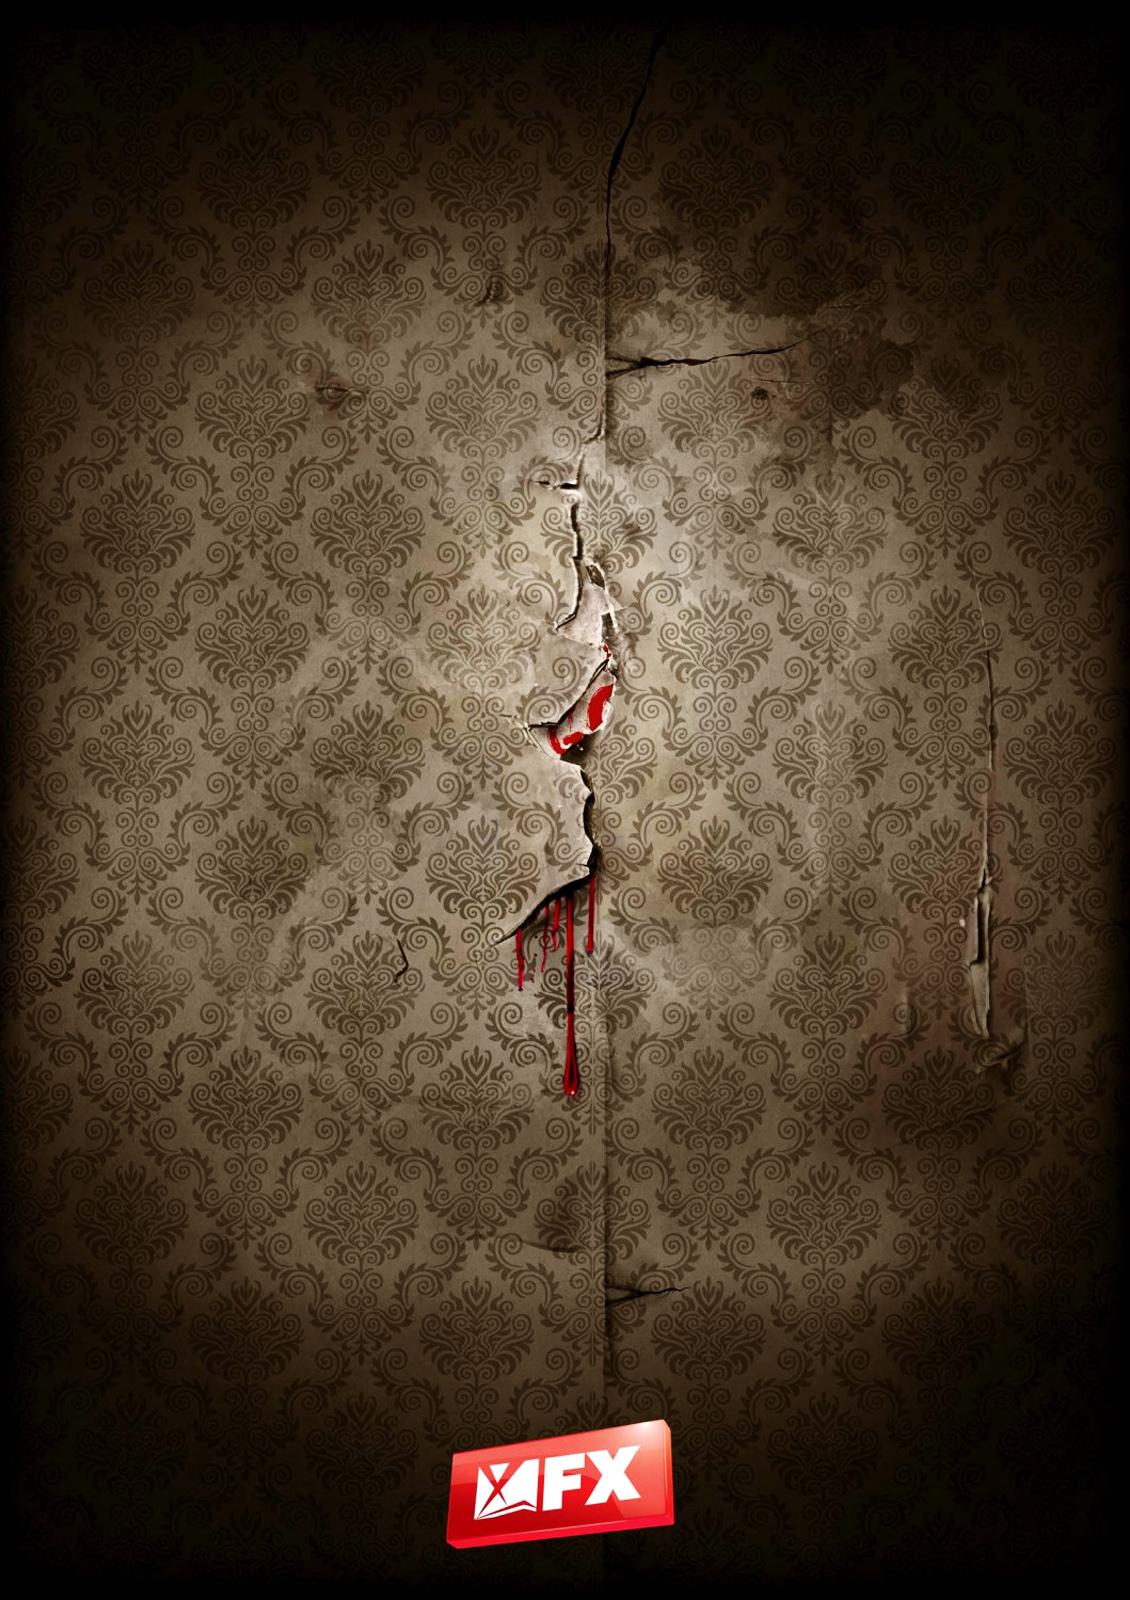 http://3.bp.blogspot.com/-0PSA5wVS3C0/UICTo5JpOFI/AAAAAAAAFiA/tgBICviPI80/s1600/American-Horror-Story-HD-Phone-Wallpaper_Vvallpaper.Net.jpg